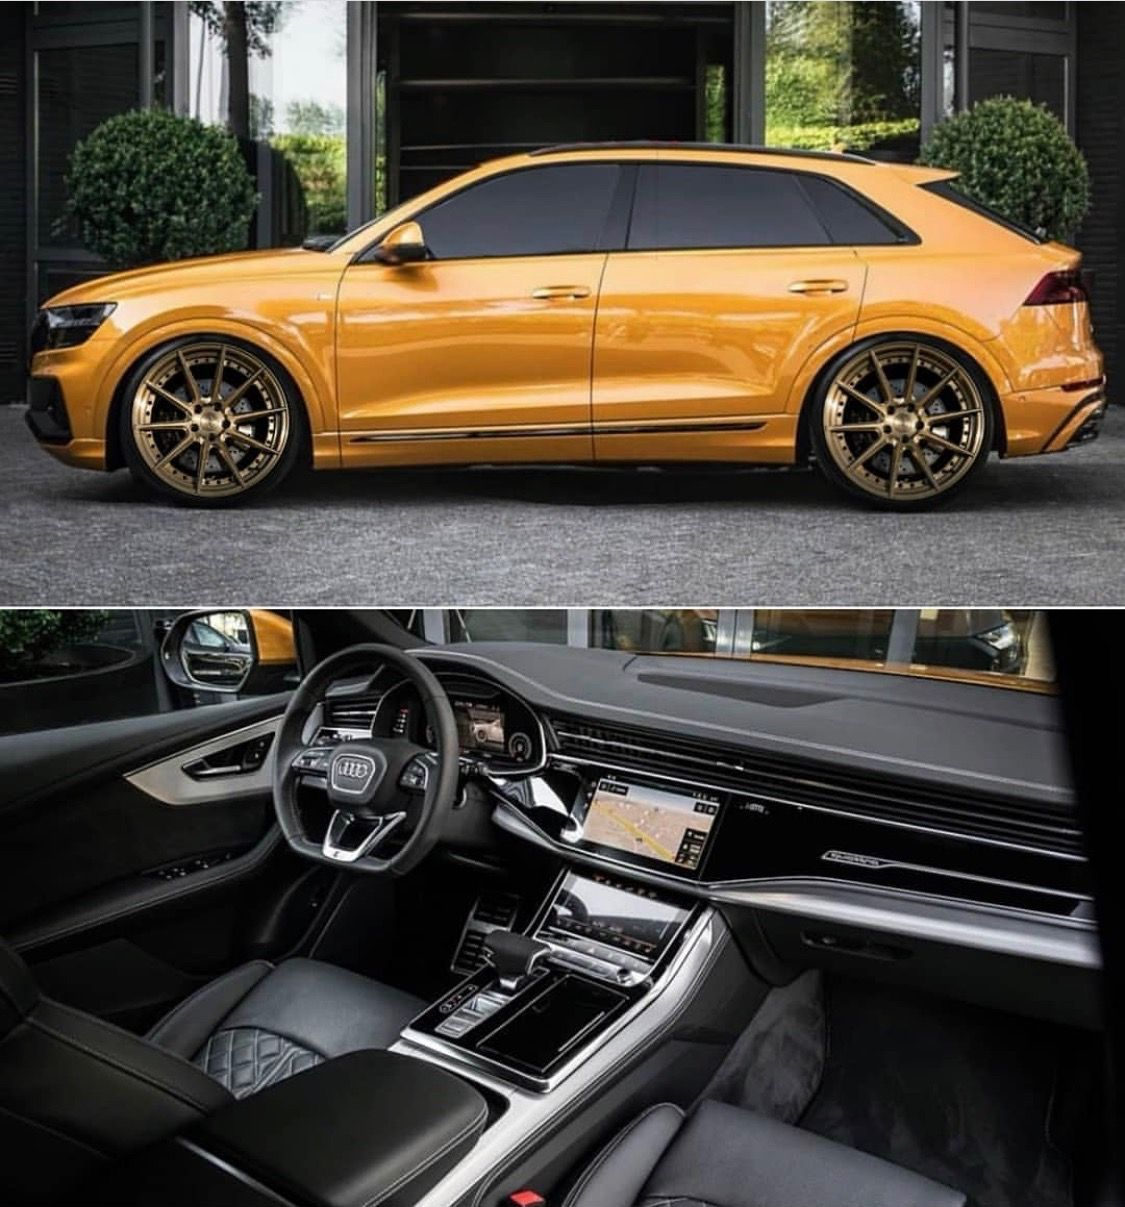 Audi Q8 Golden Audi Toyota Carina Audi Suv